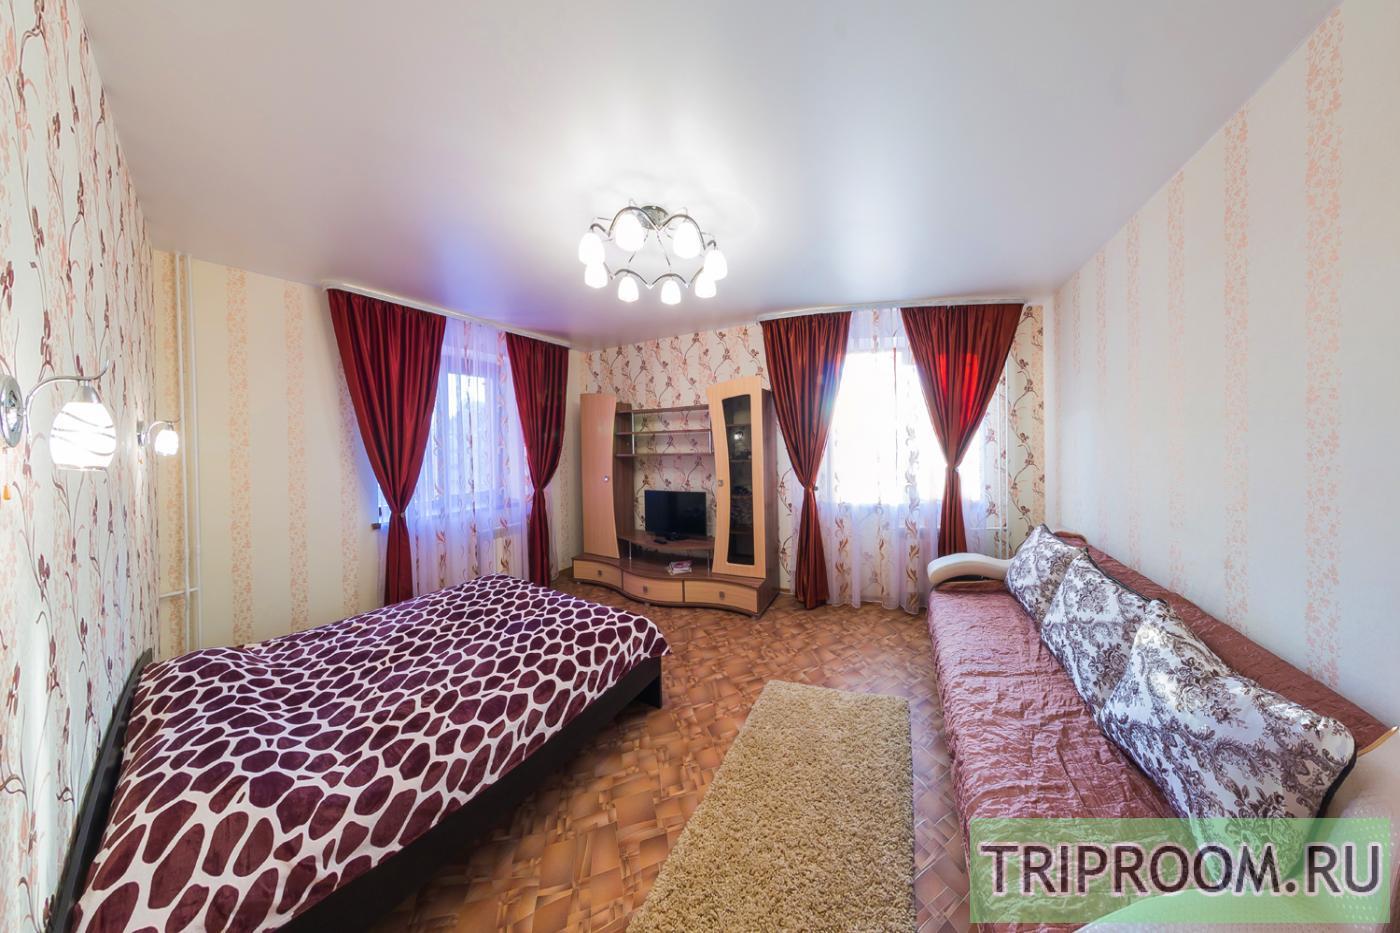 1-комнатная квартира посуточно (вариант № 17182), ул. Костычева улица, фото № 6